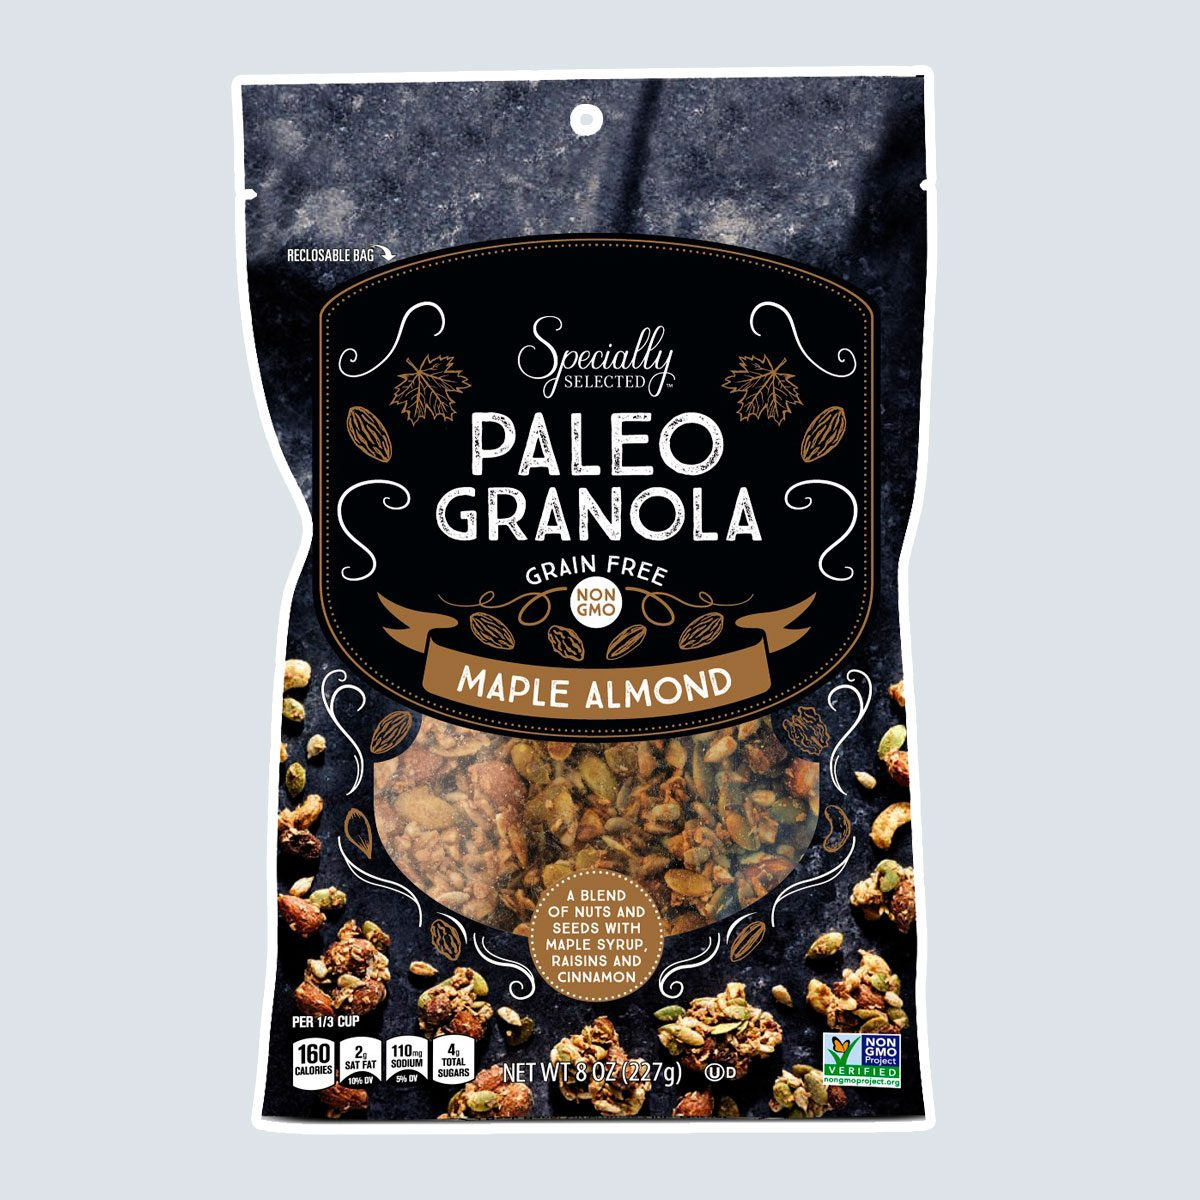 Paleo Granola Maple Almond